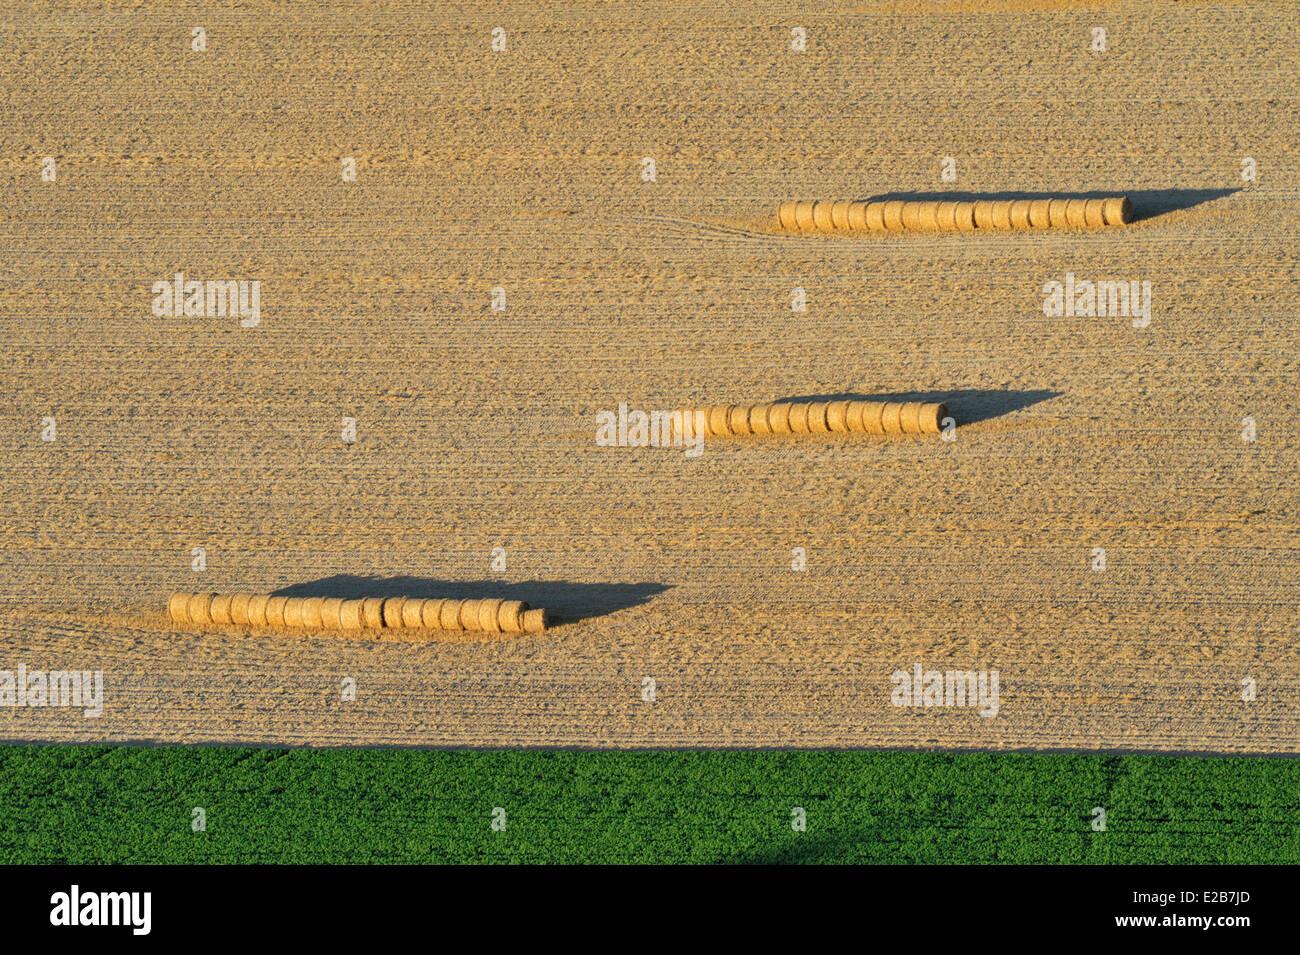 France, Pas de Calais, Loos en Gohelle, straw bales in a field - Stock Image